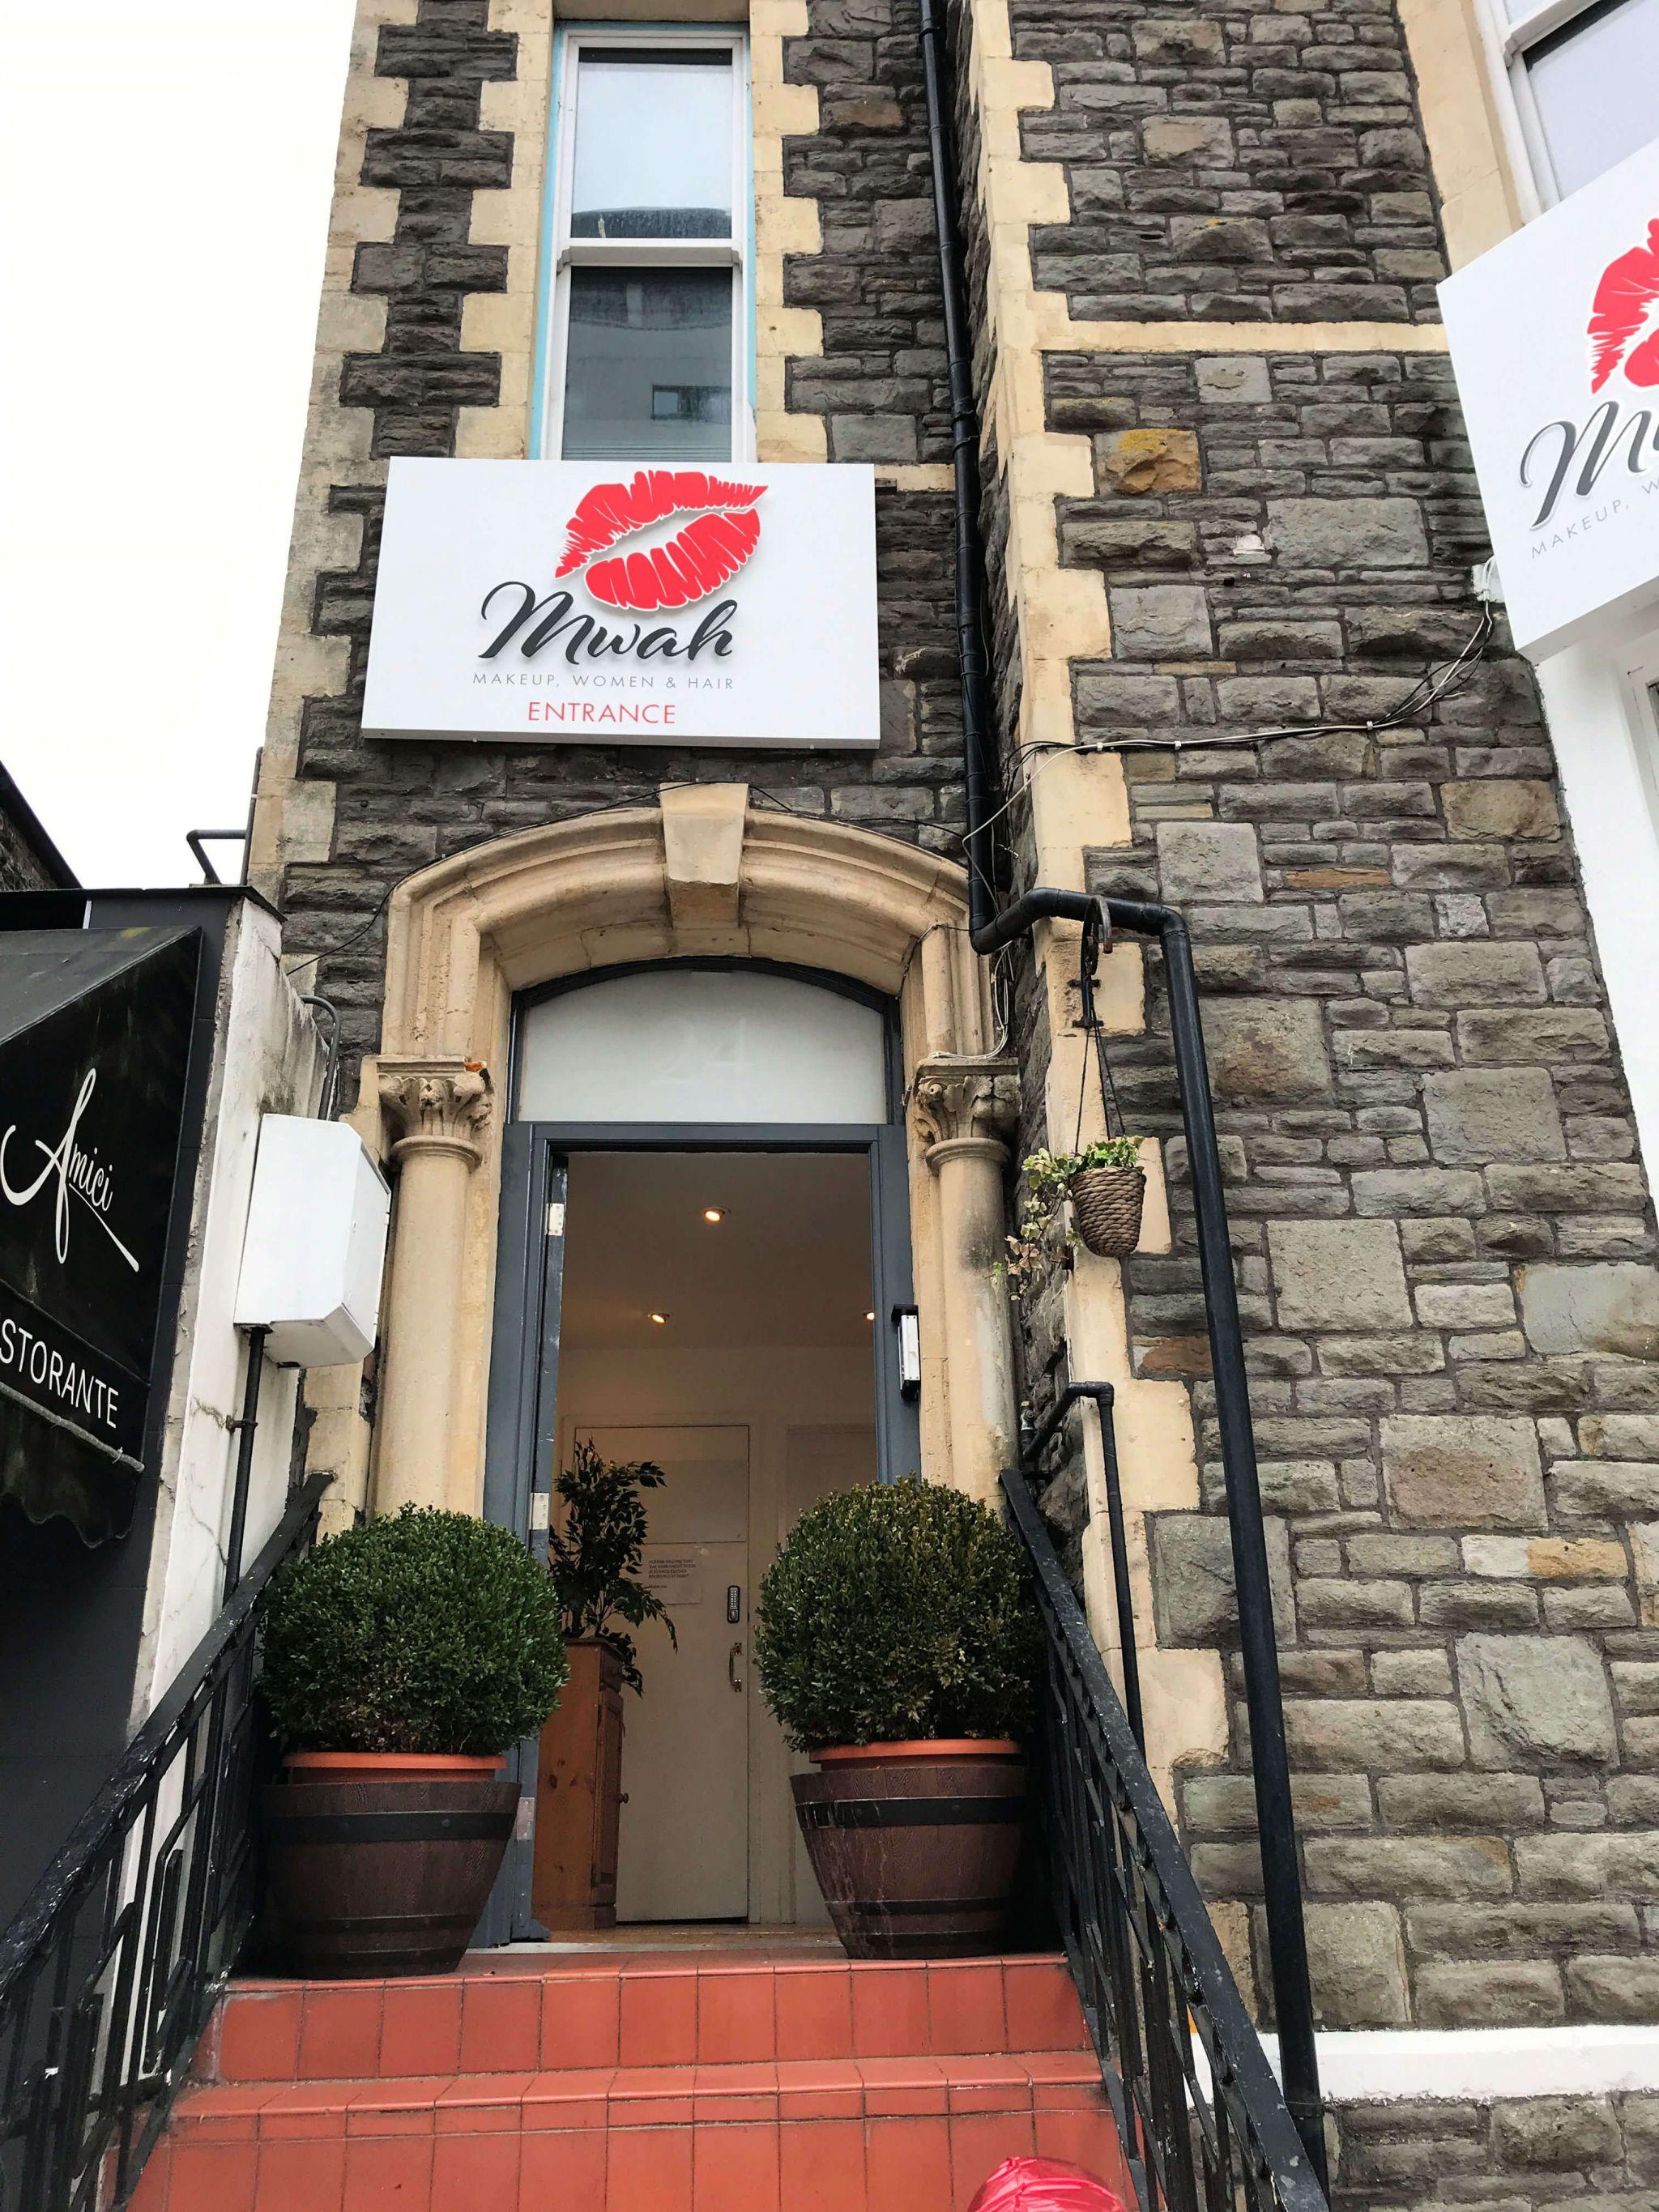 Mwah Cardiff entrance